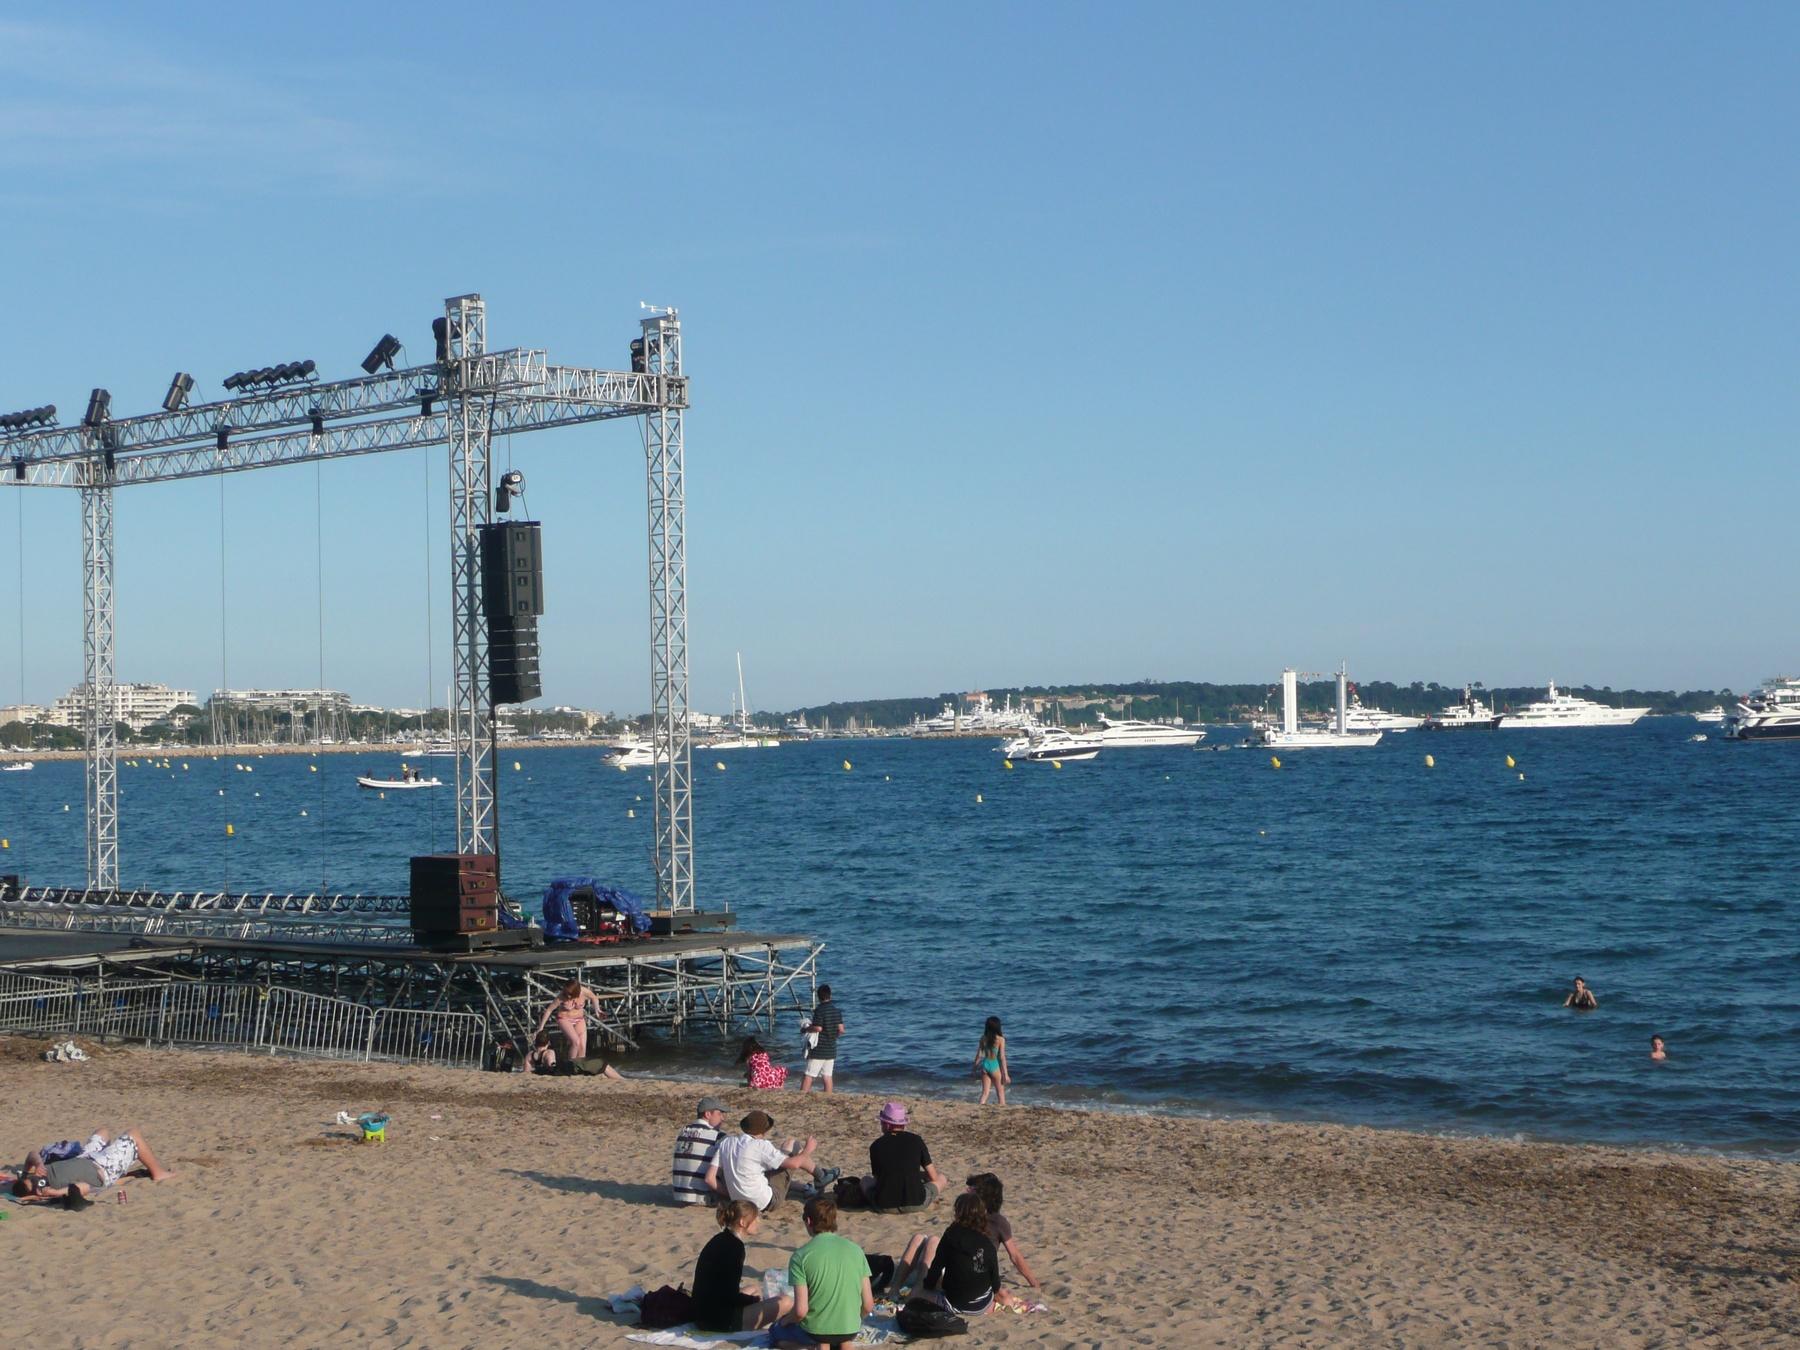 Openlucht film Croisette Cannes tijdens Filmfestival